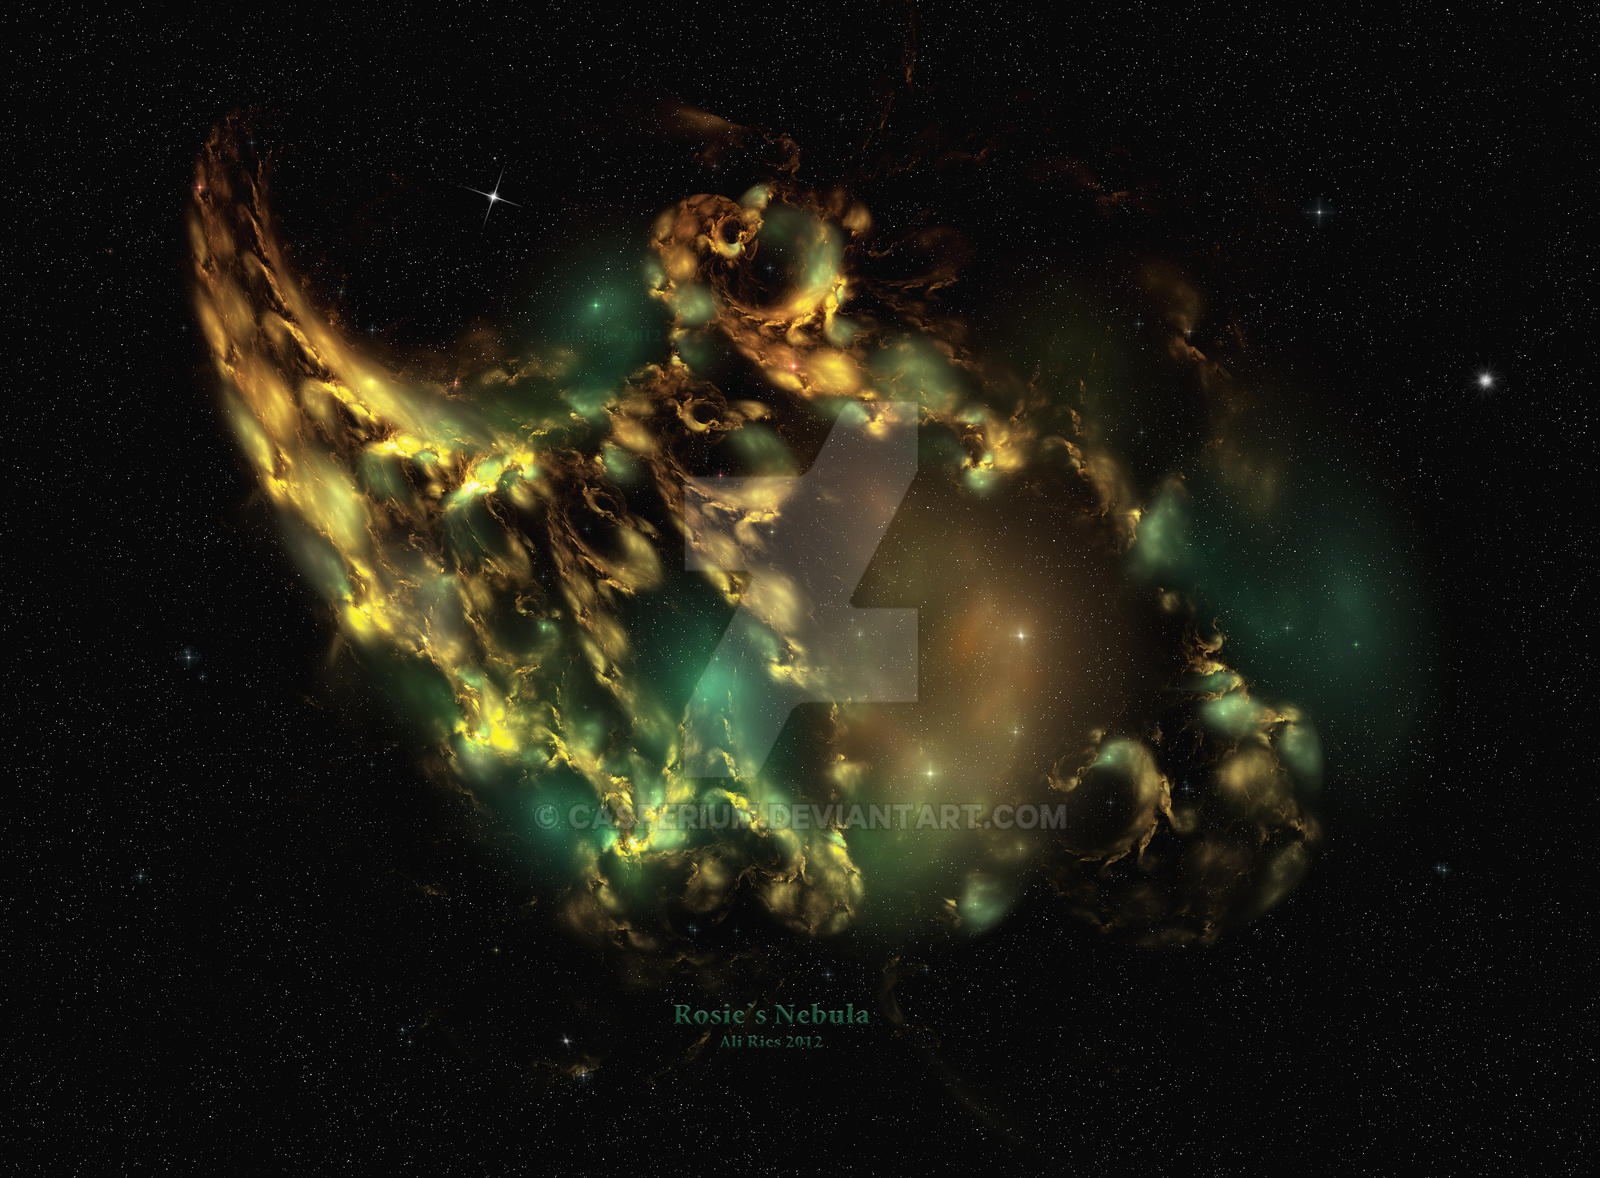 Rosie's Nebula by Casperium